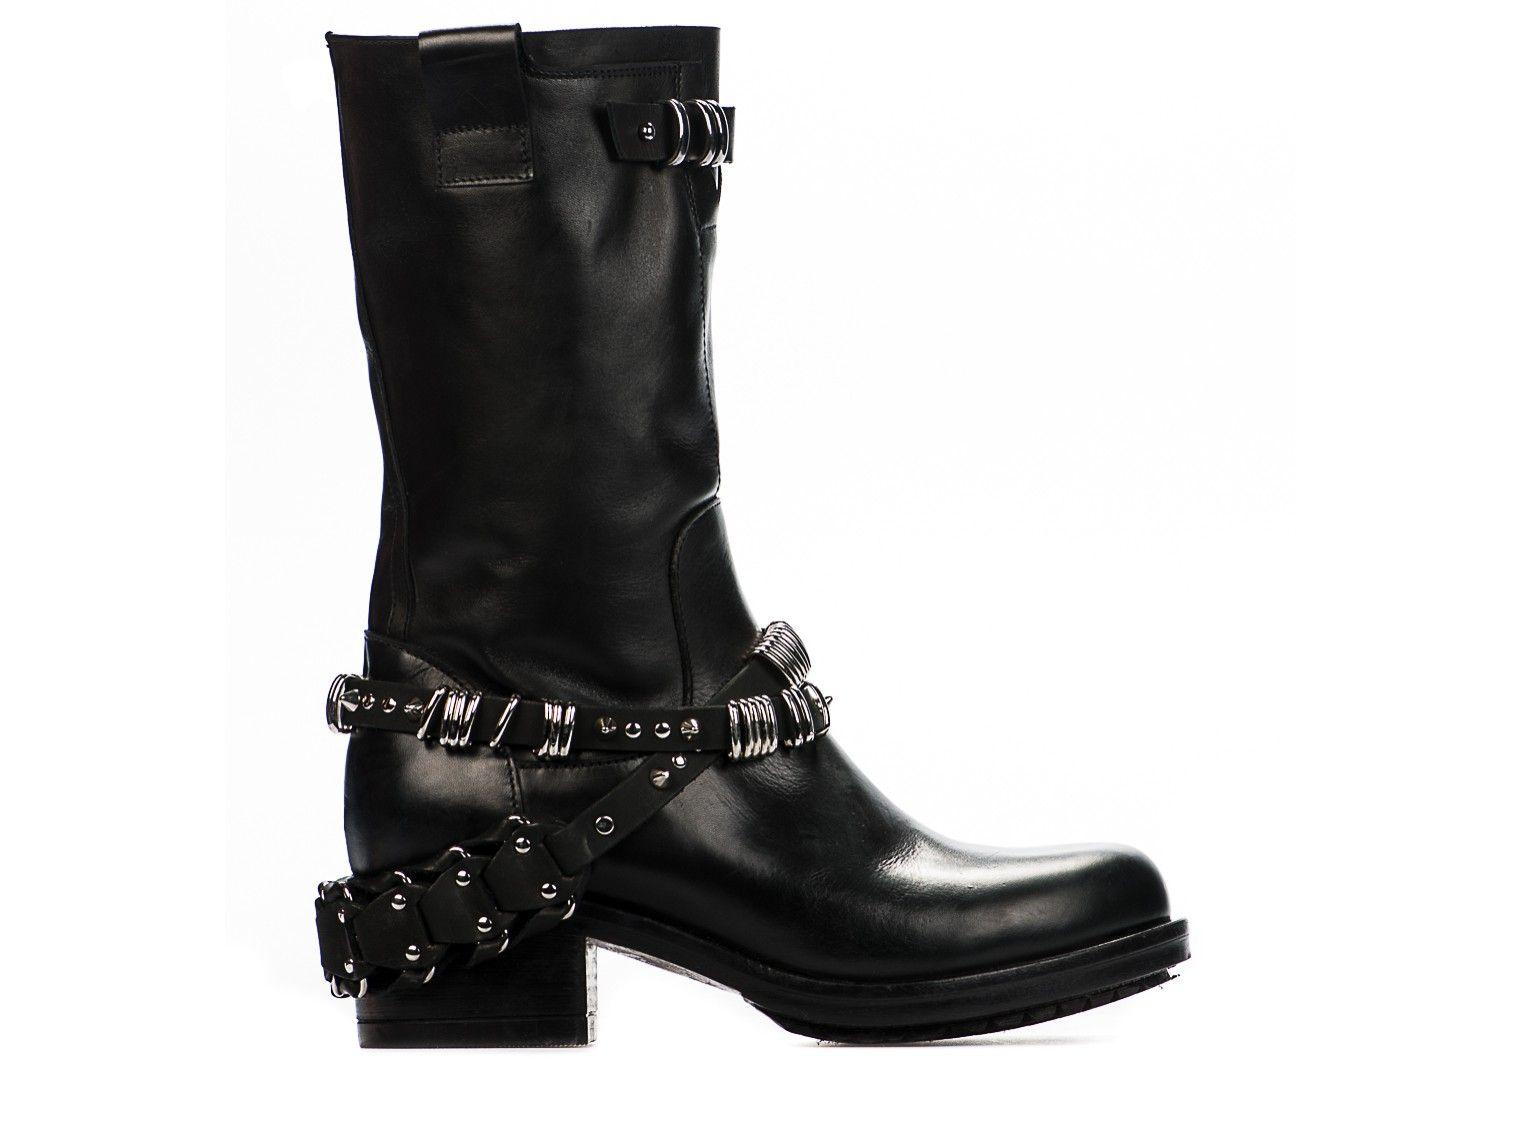 Bottines femme - MIGLIO - Noir - 3577X38 4fh3eoWU